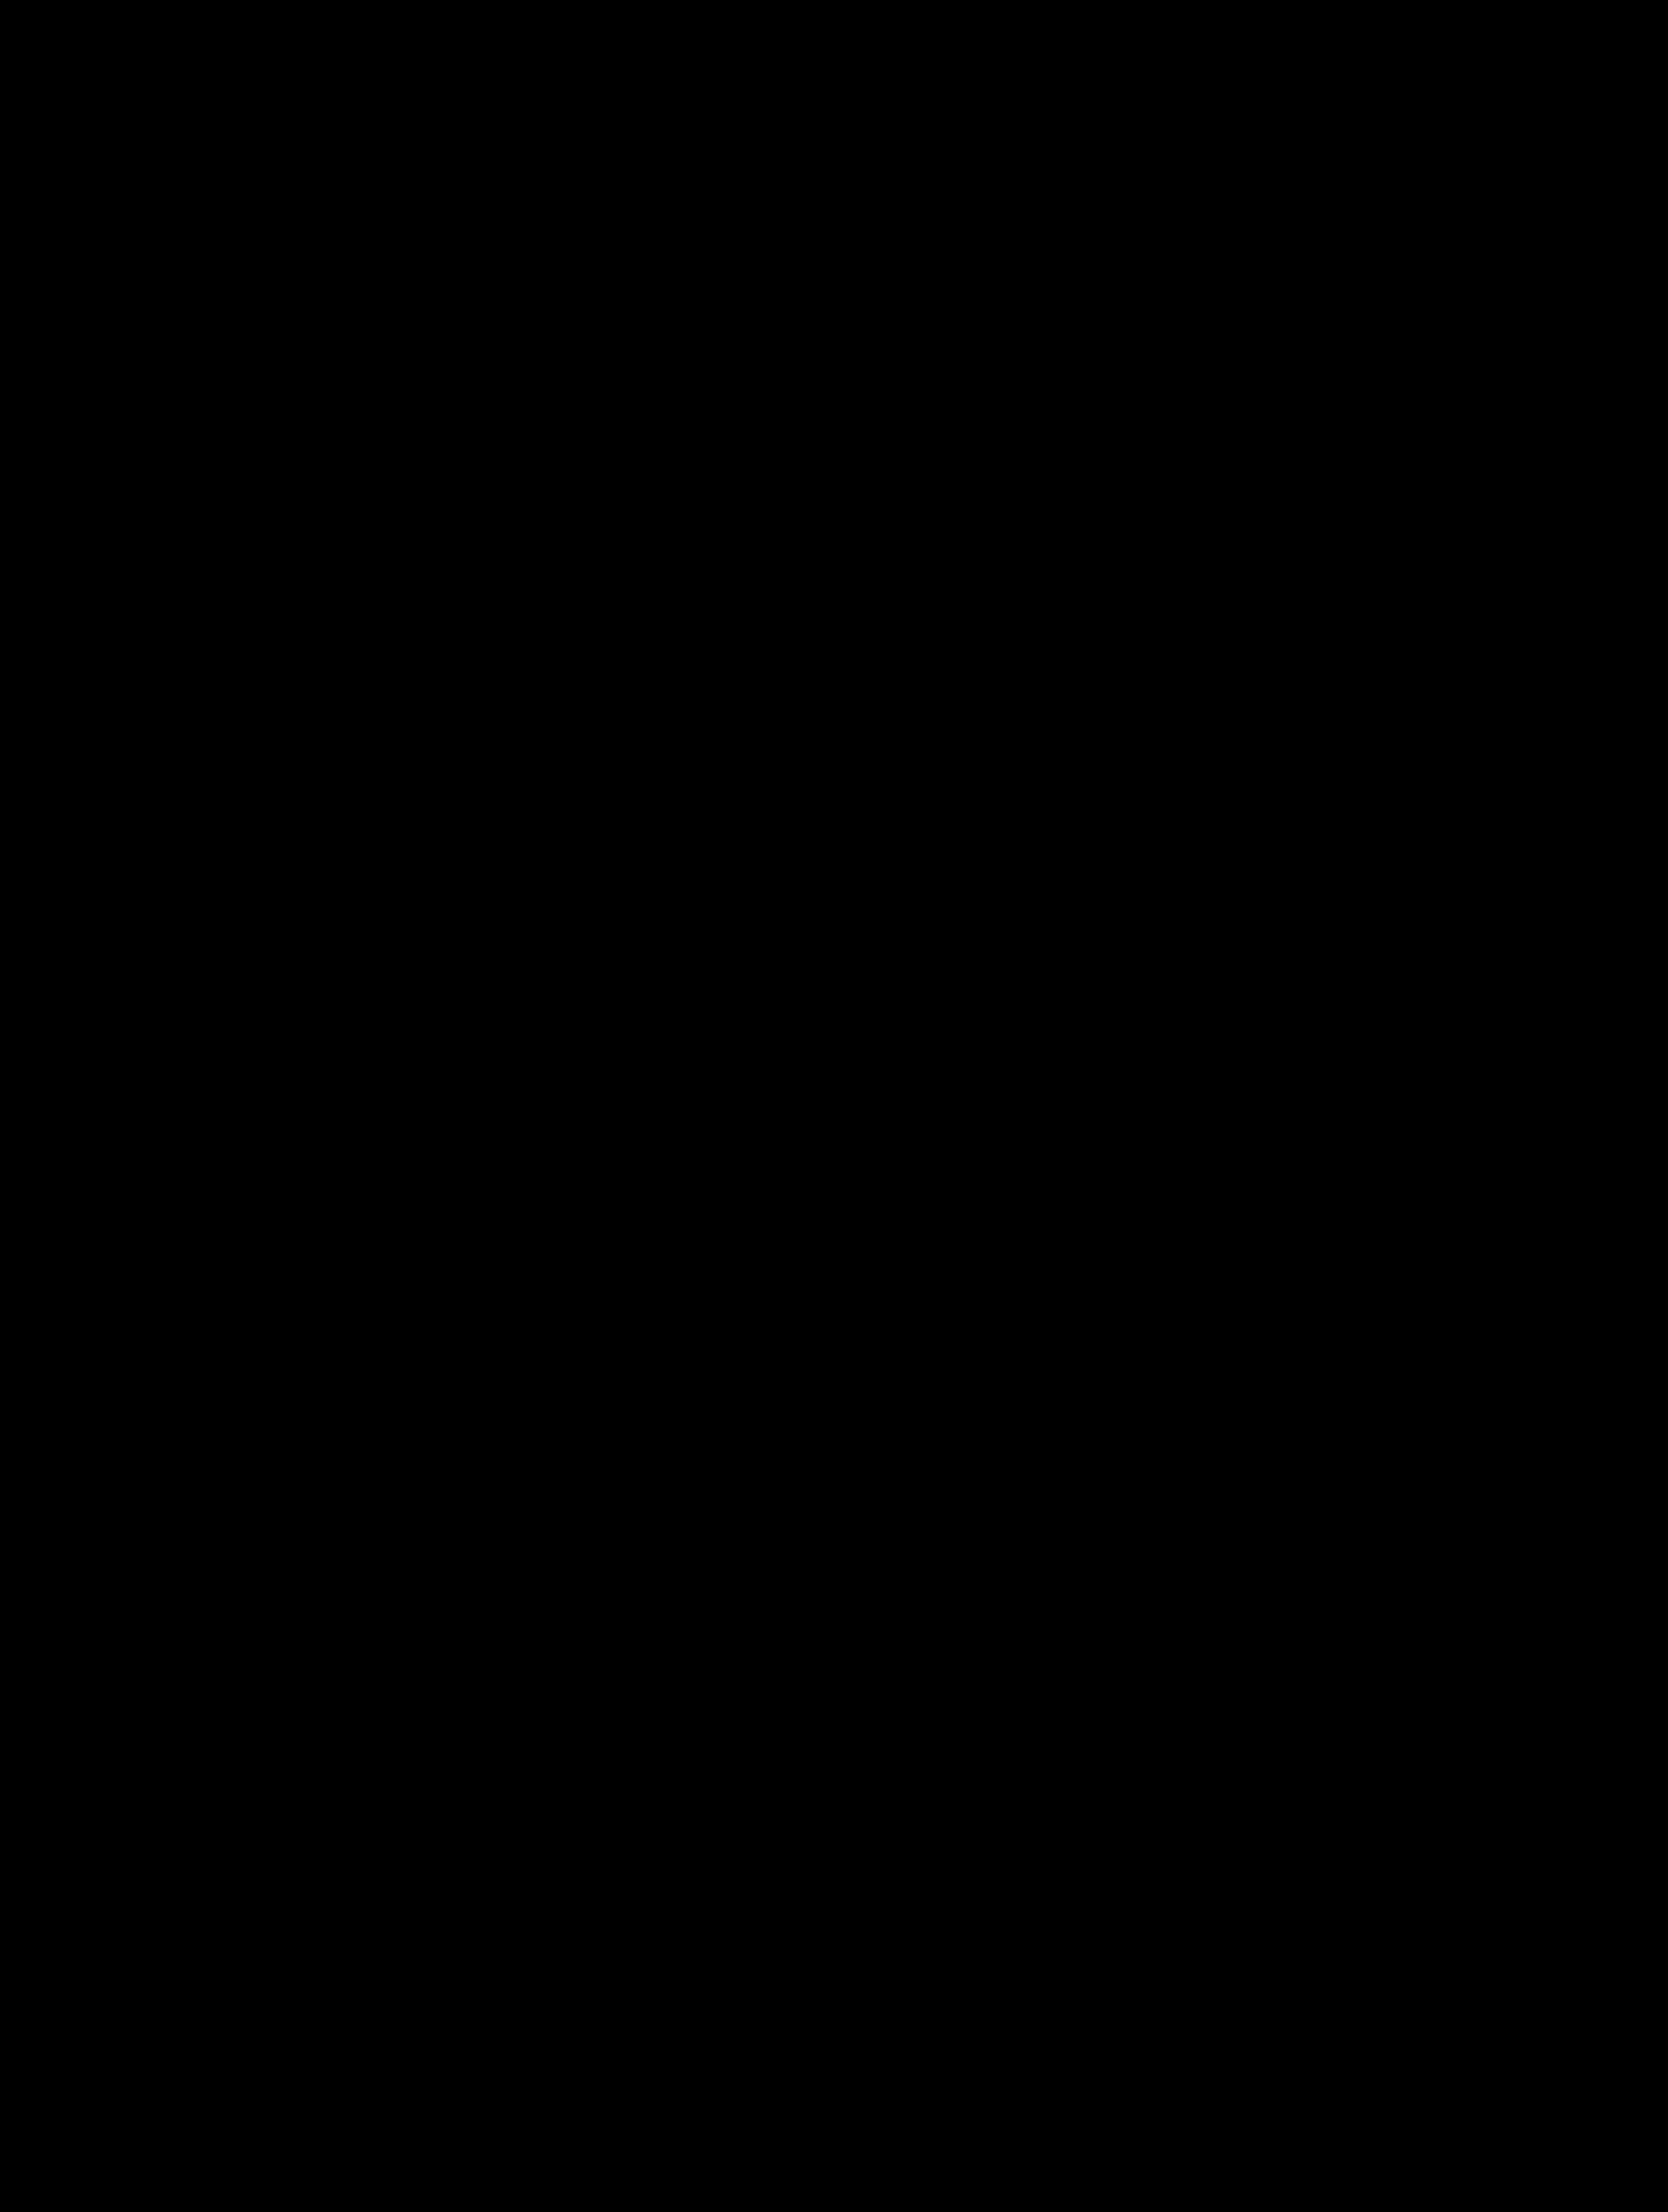 File kih oskh symbol. Cigar clipart svg